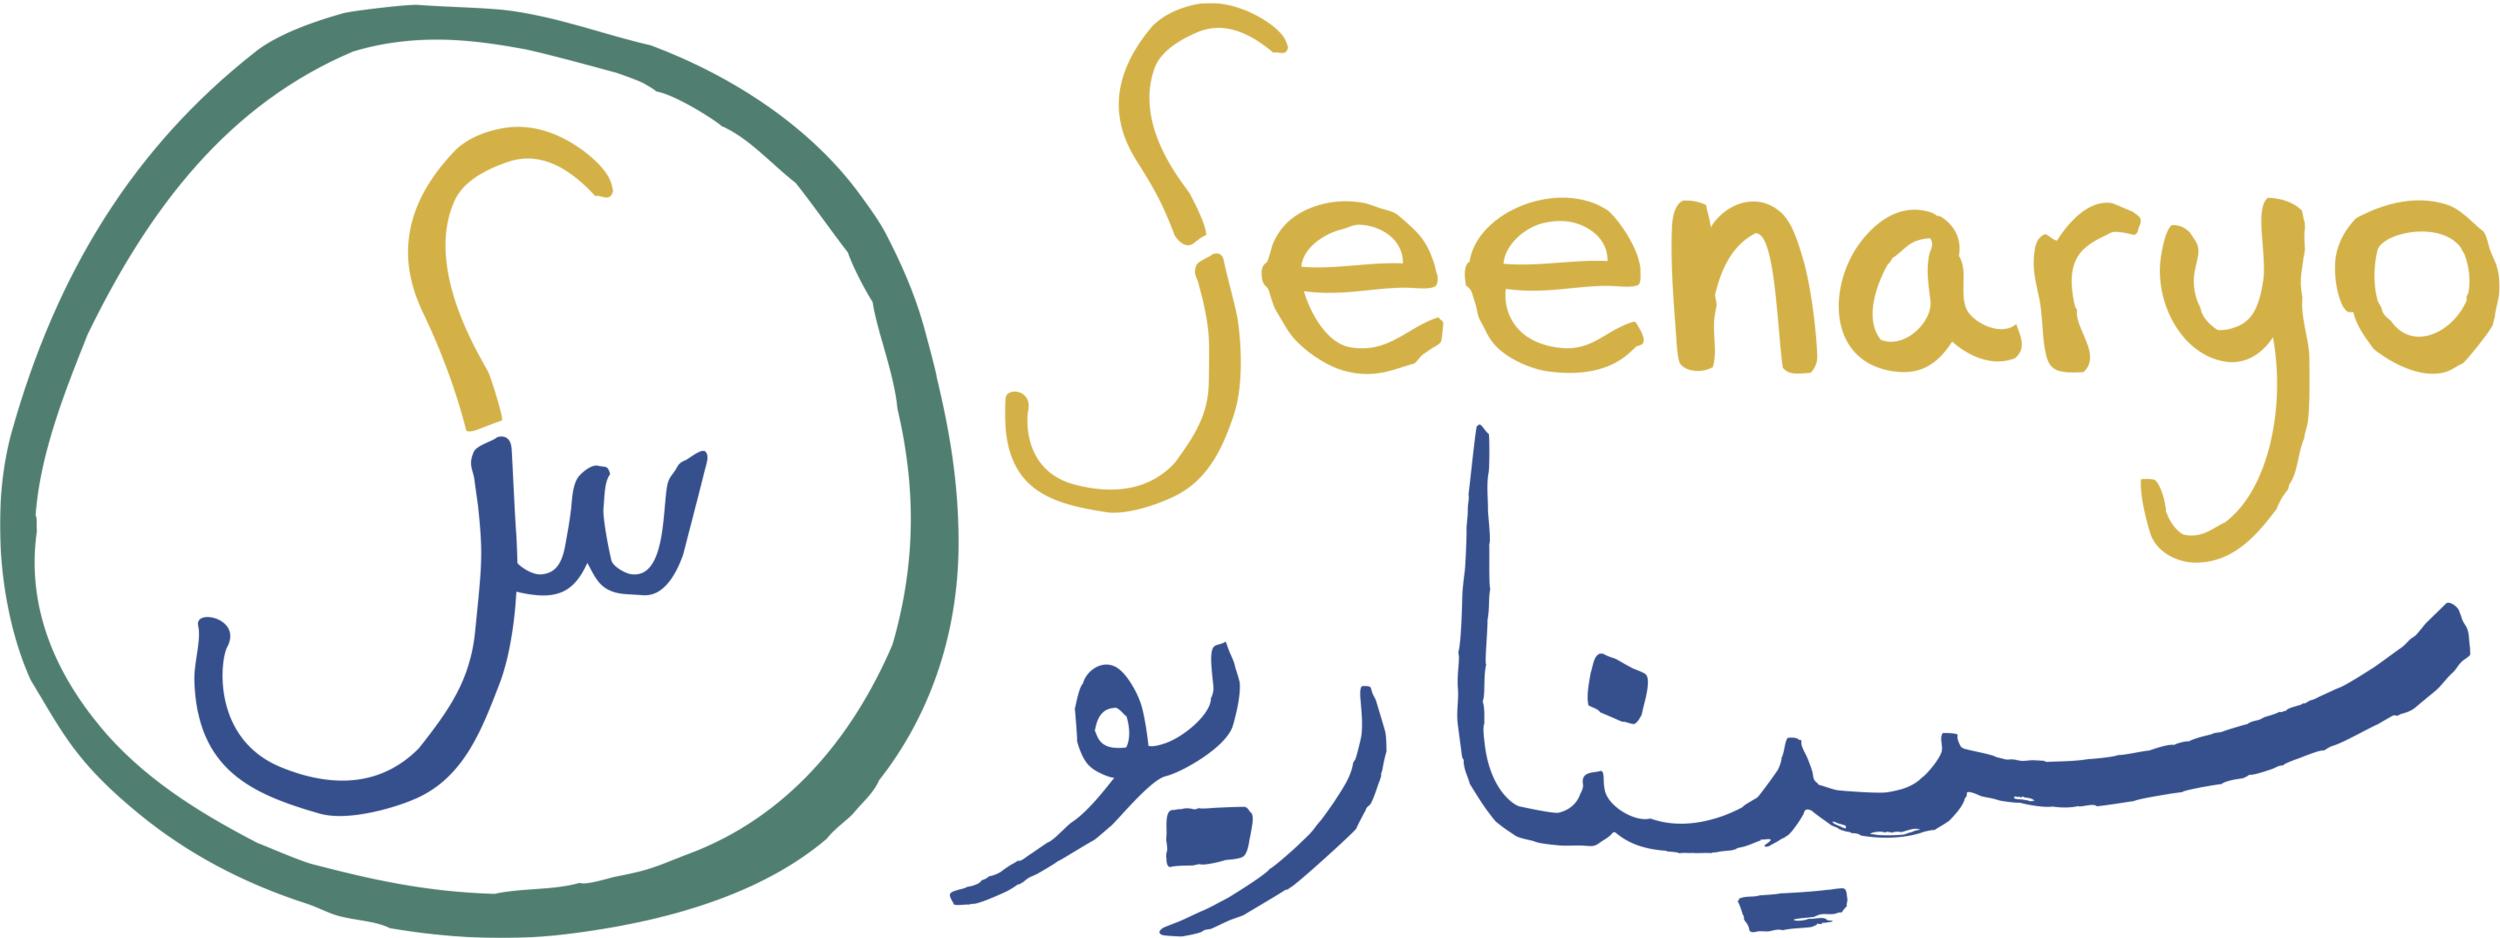 Seenaryo_logo_colour.png